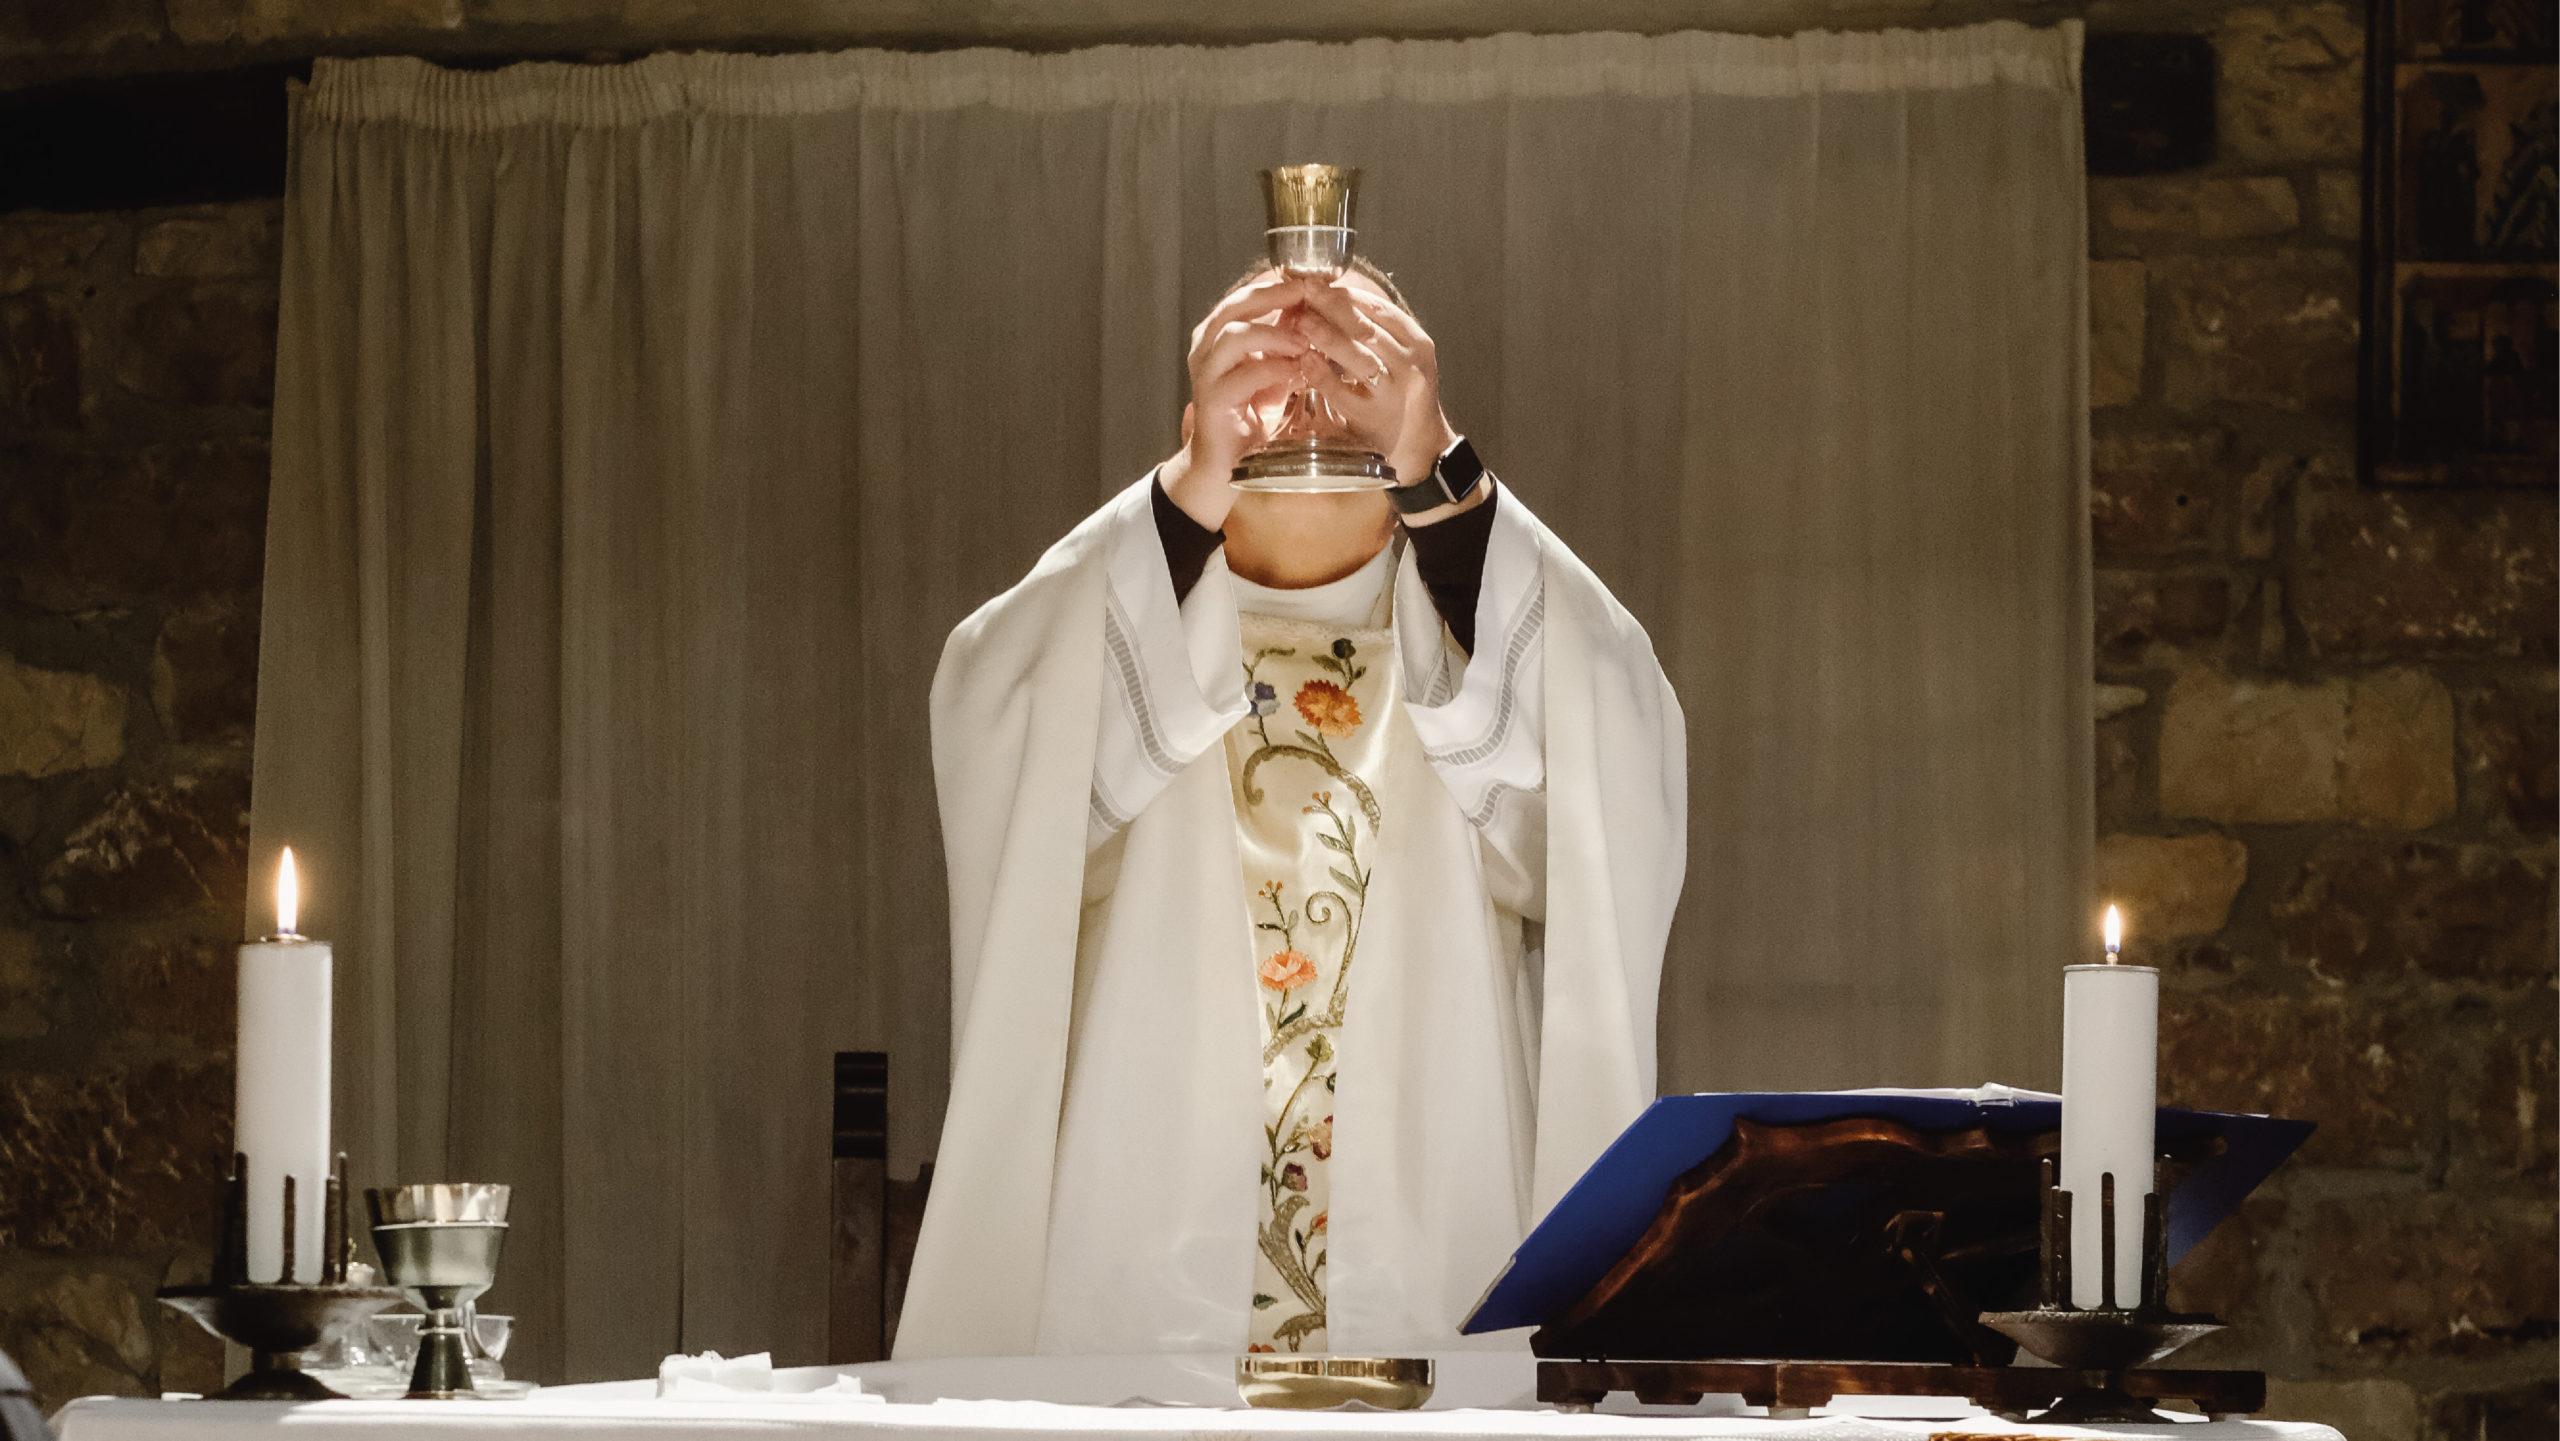 La Iglesia católica pide evitar nueva ola de Covid-19 en Semana Santa